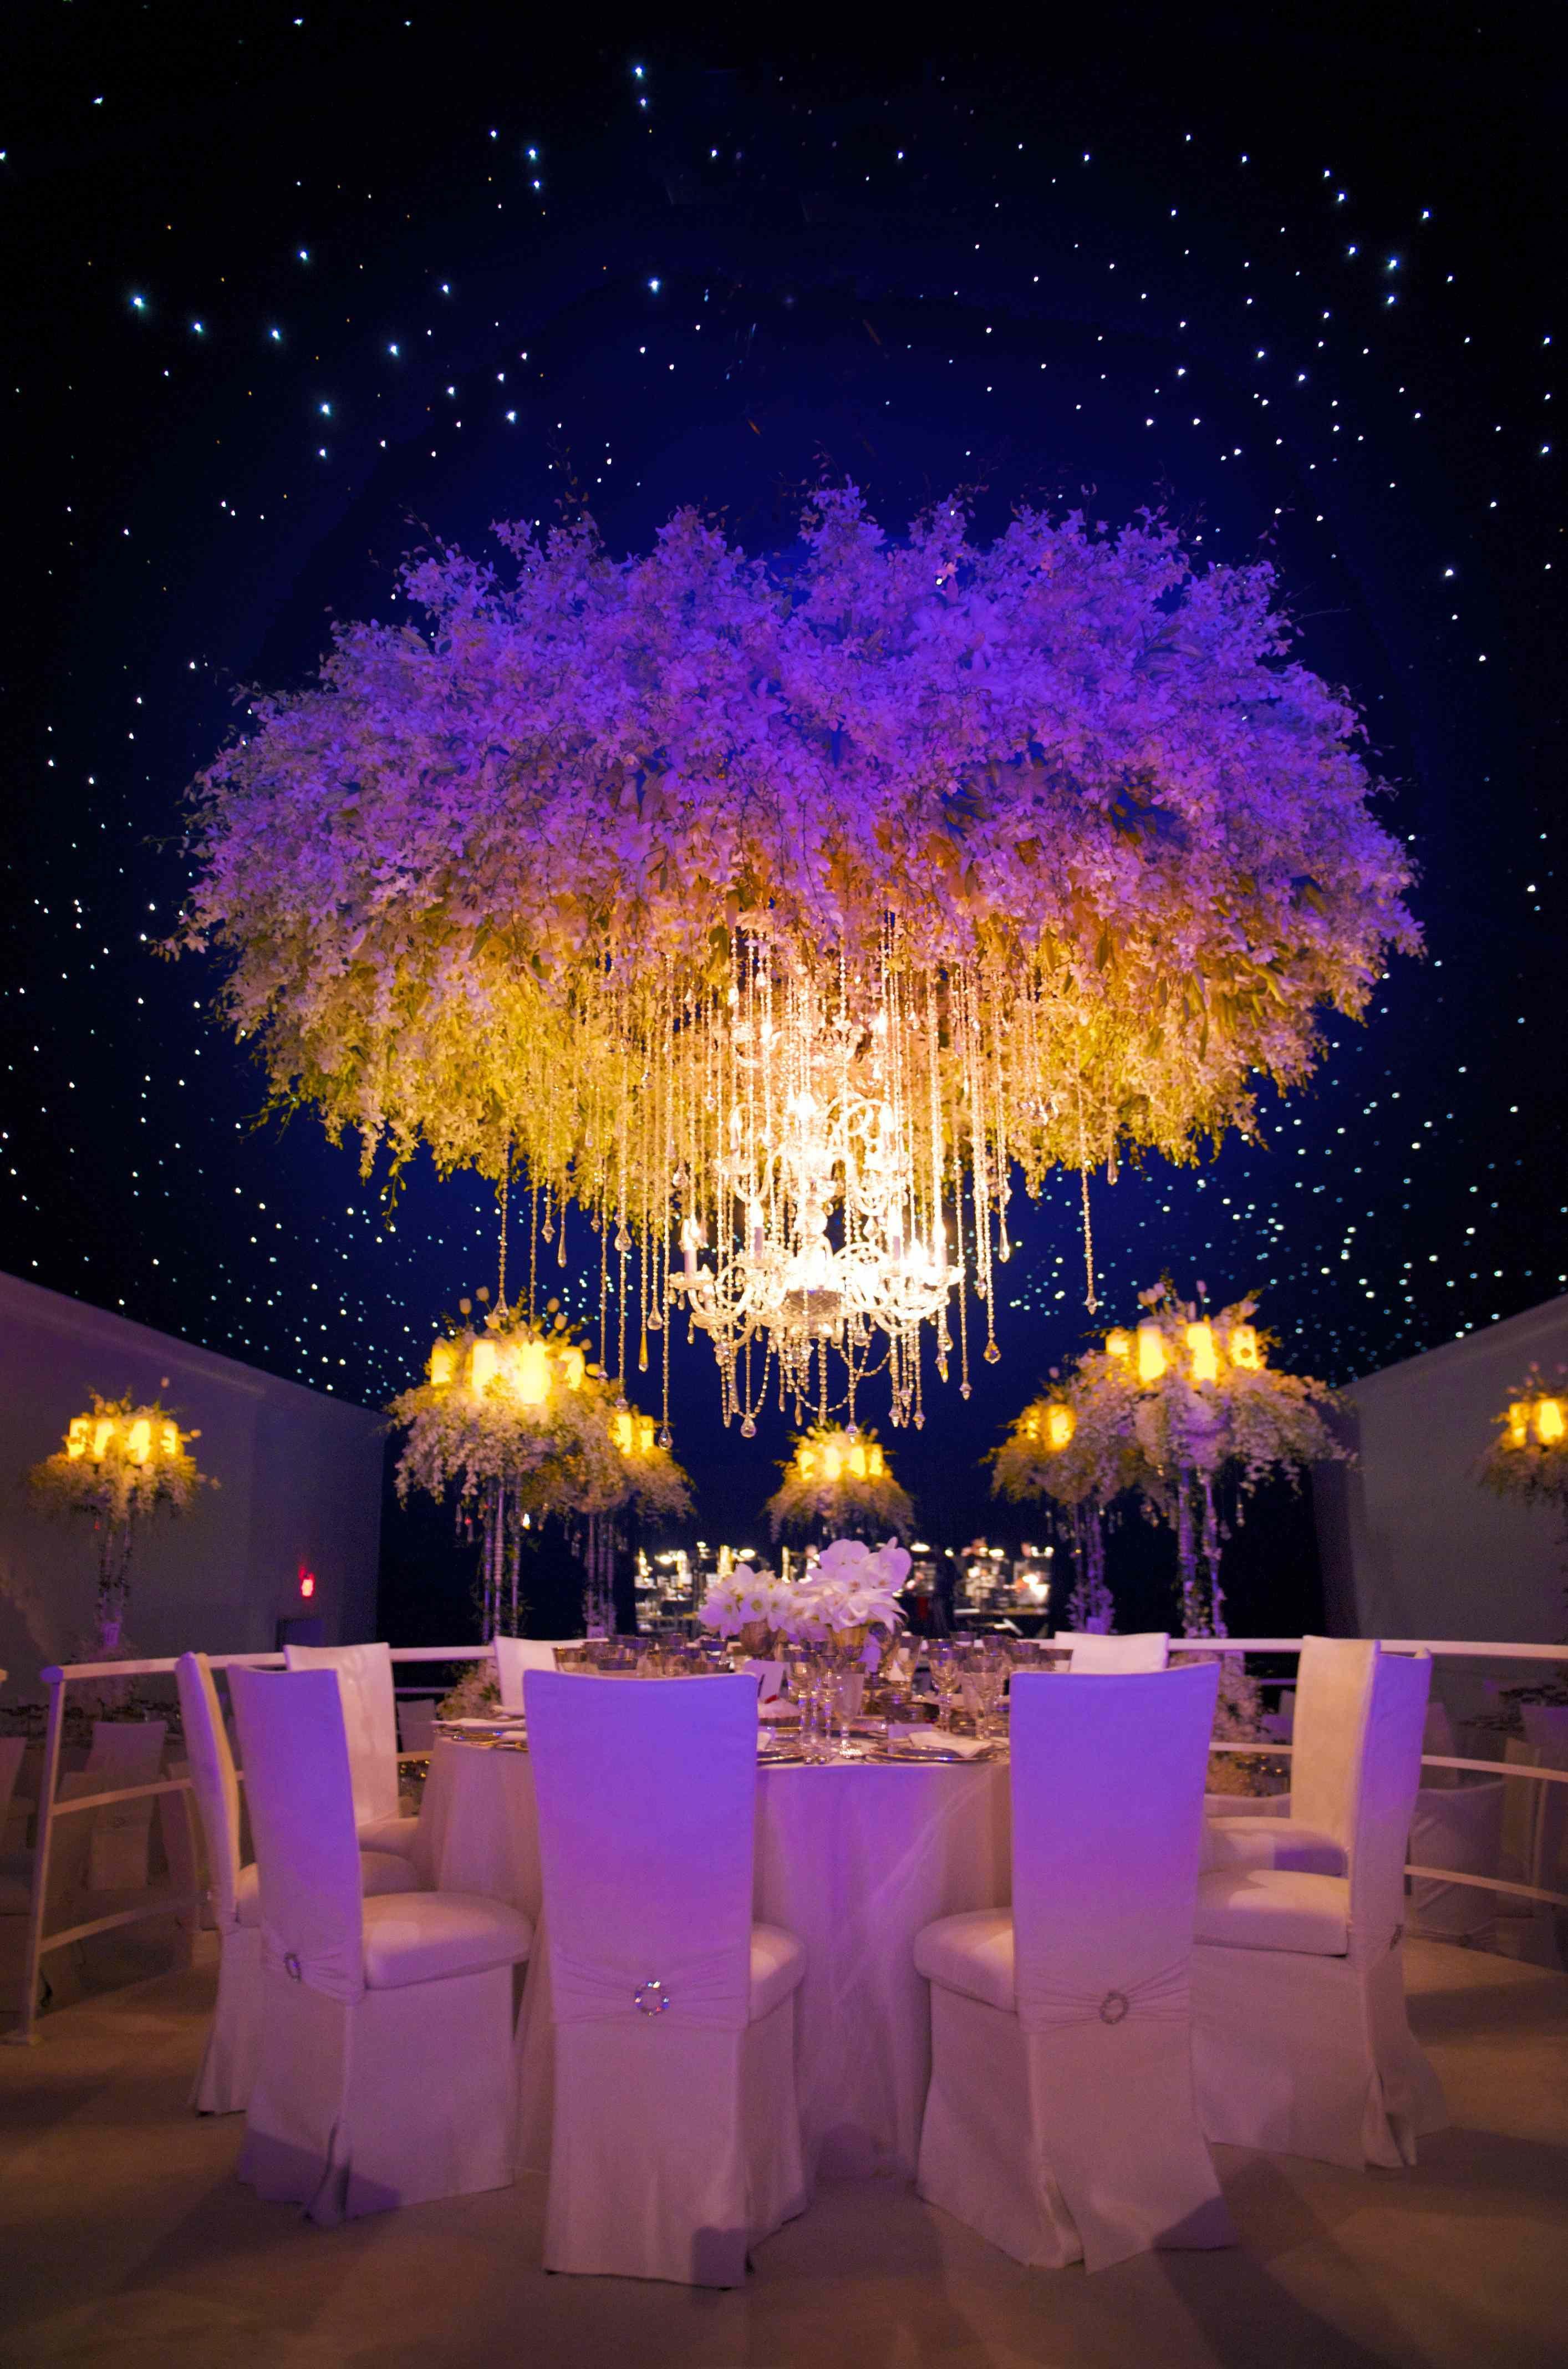 diy outdoor wedding lighting ideas%0A Diy wedding reception